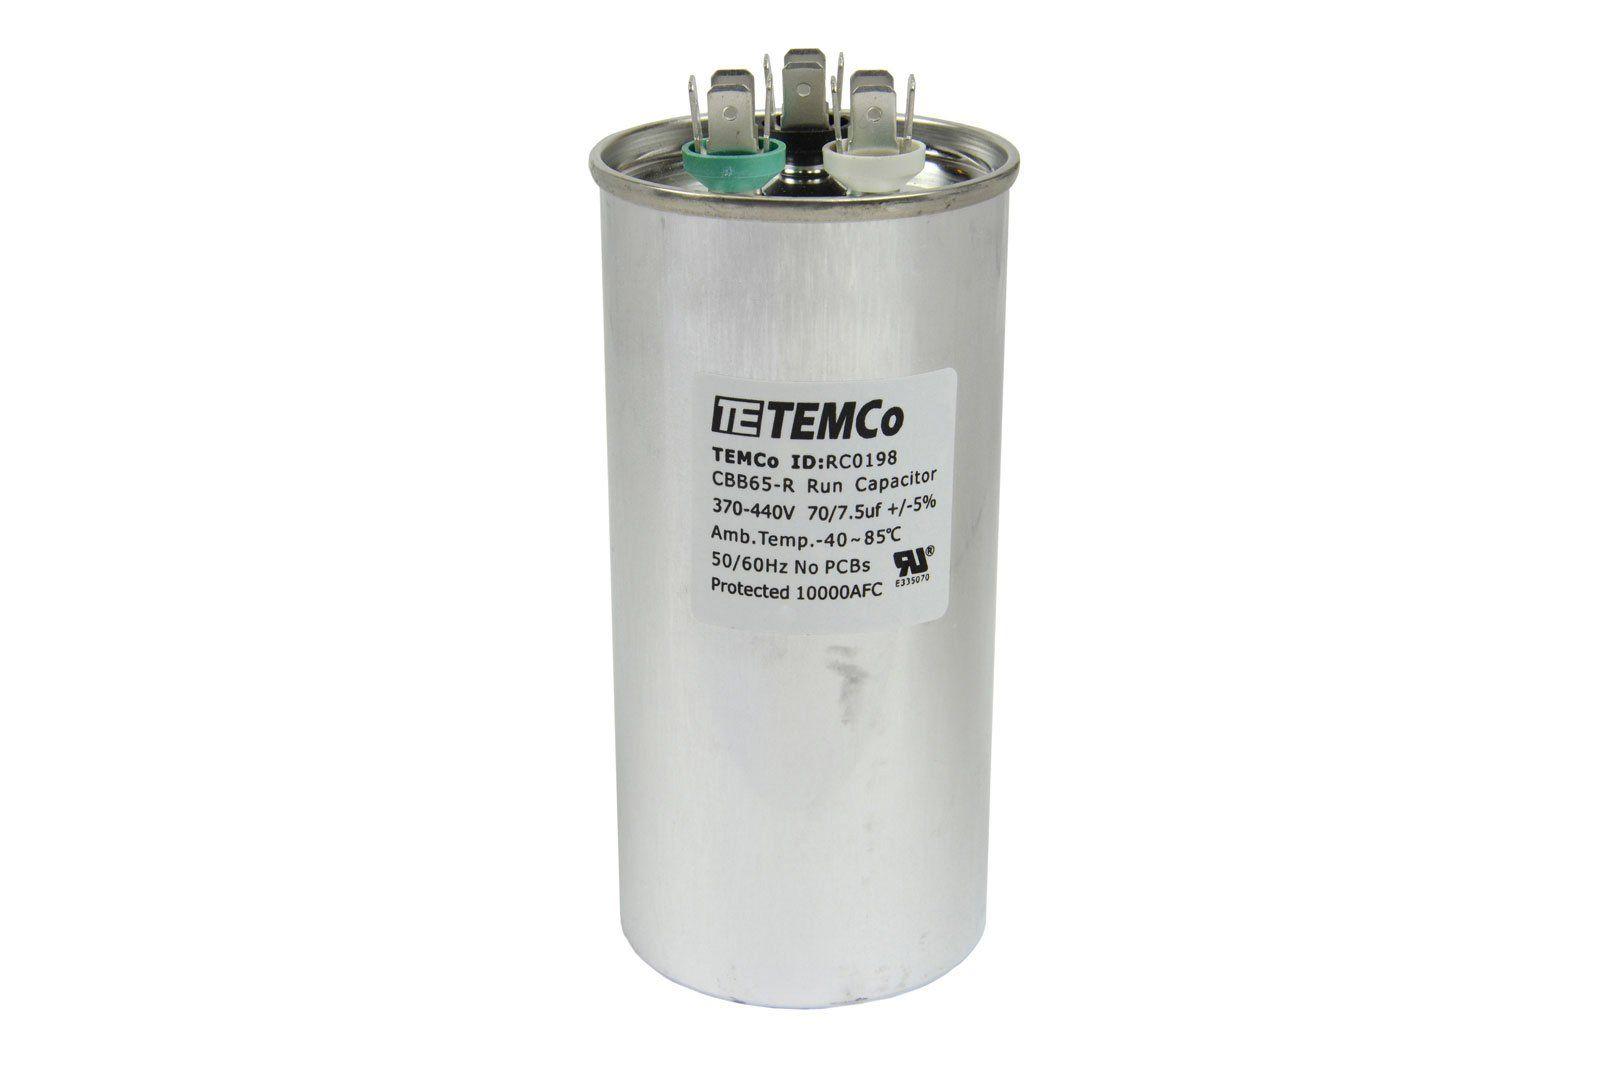 Temco 10 Lot Dual Run Capacitor Rc020070 7 5 Mfd 370 V 440 V Vac Volt 70 7 5 Uf Ac Electric Motor Hvac You Can Get More 10 Things Electric Motor Electricity